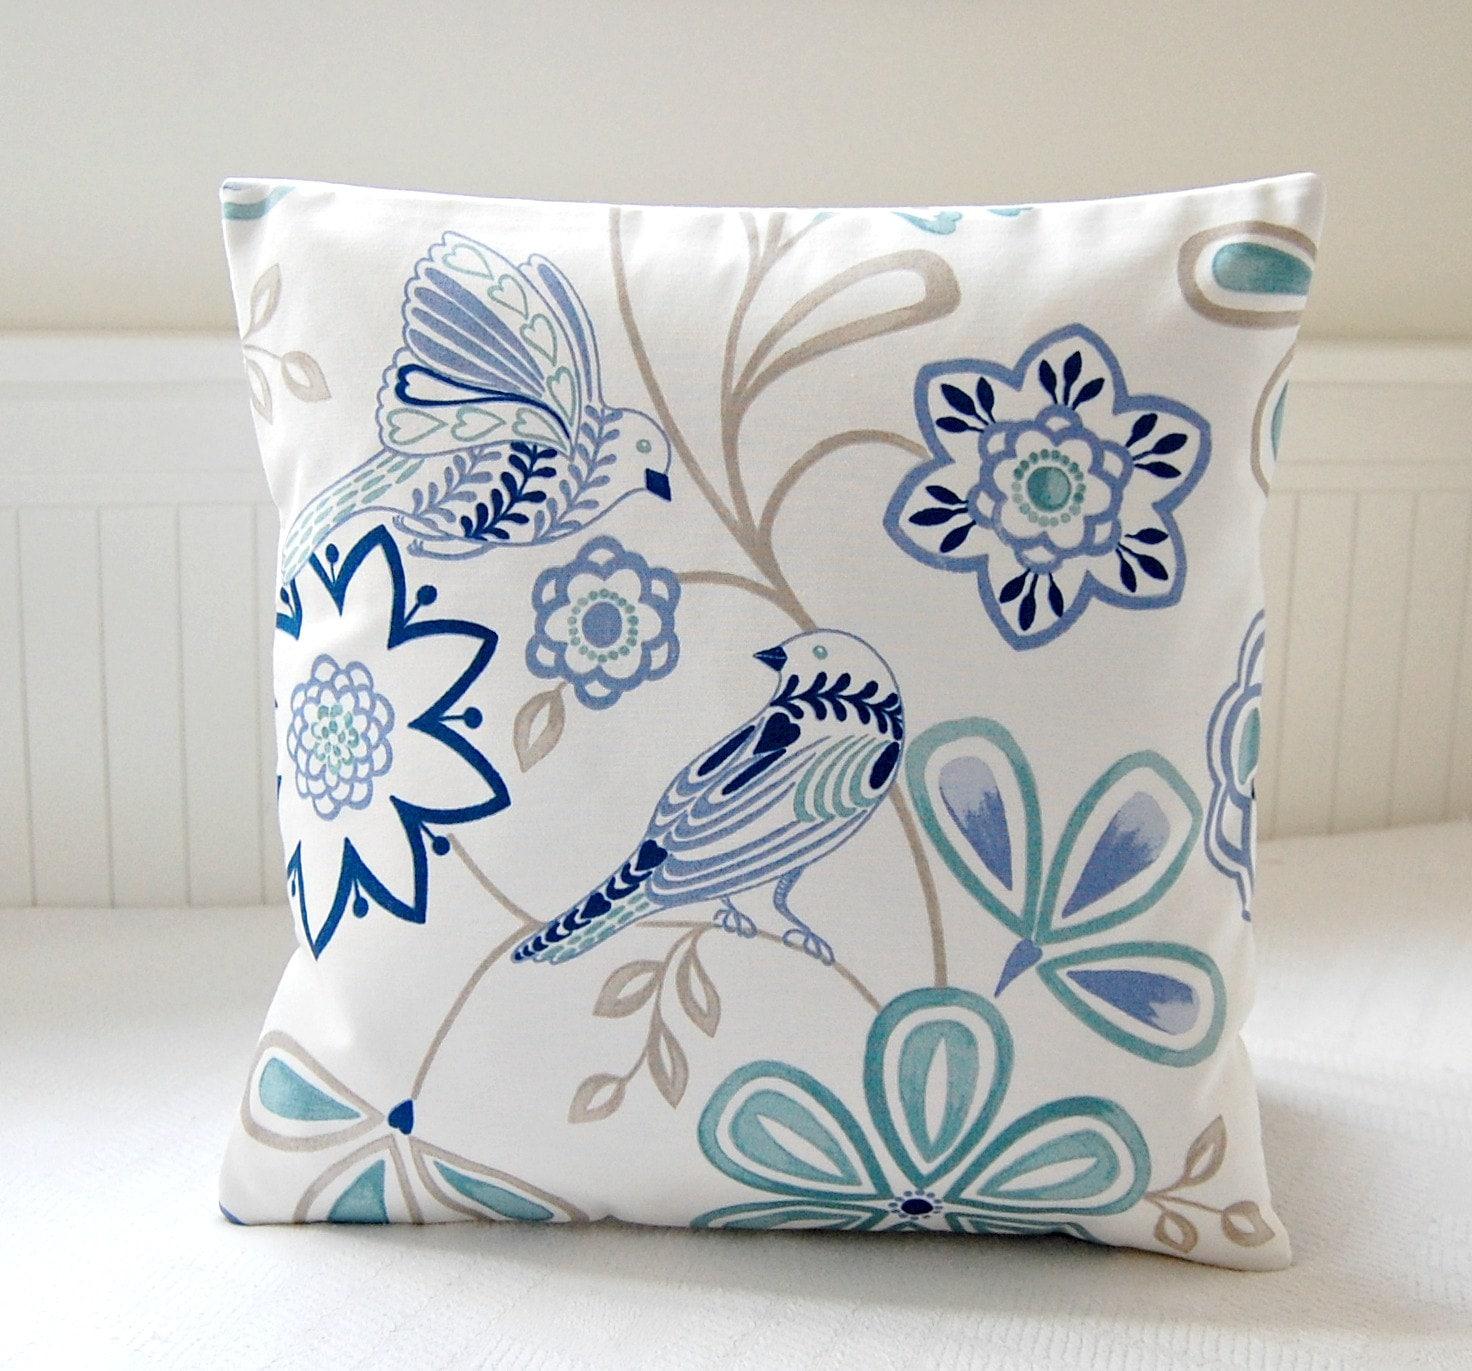 Teal Blue Decorative Pillows : birds decorative pillow cover blue teal navy flowers cushion